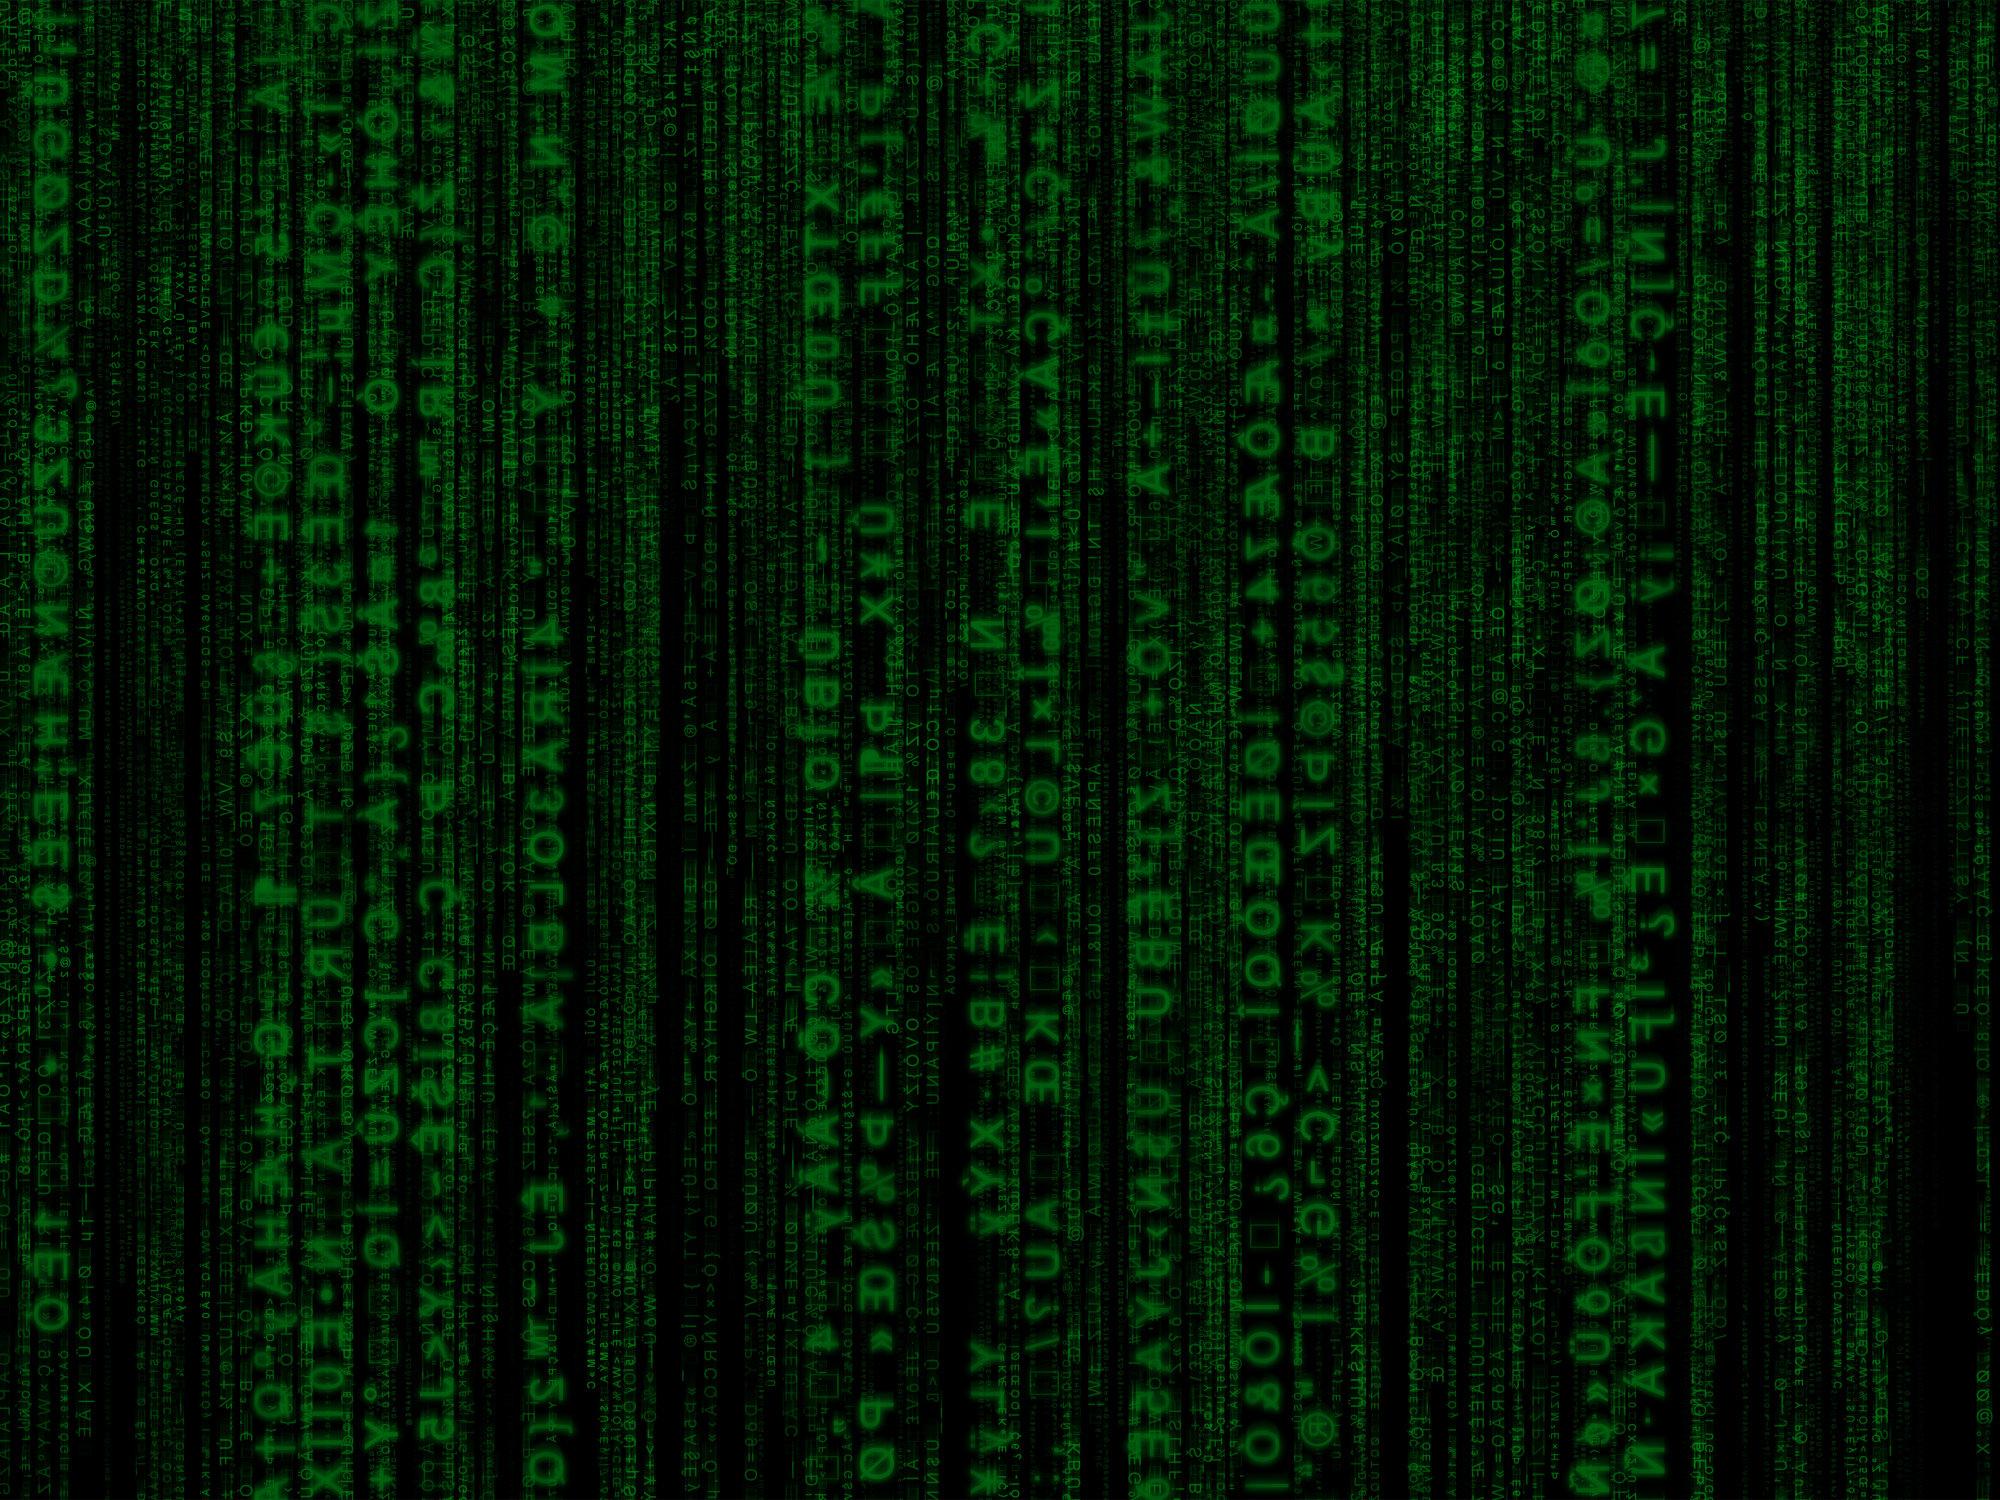 цифры из матрицы картинки кляр